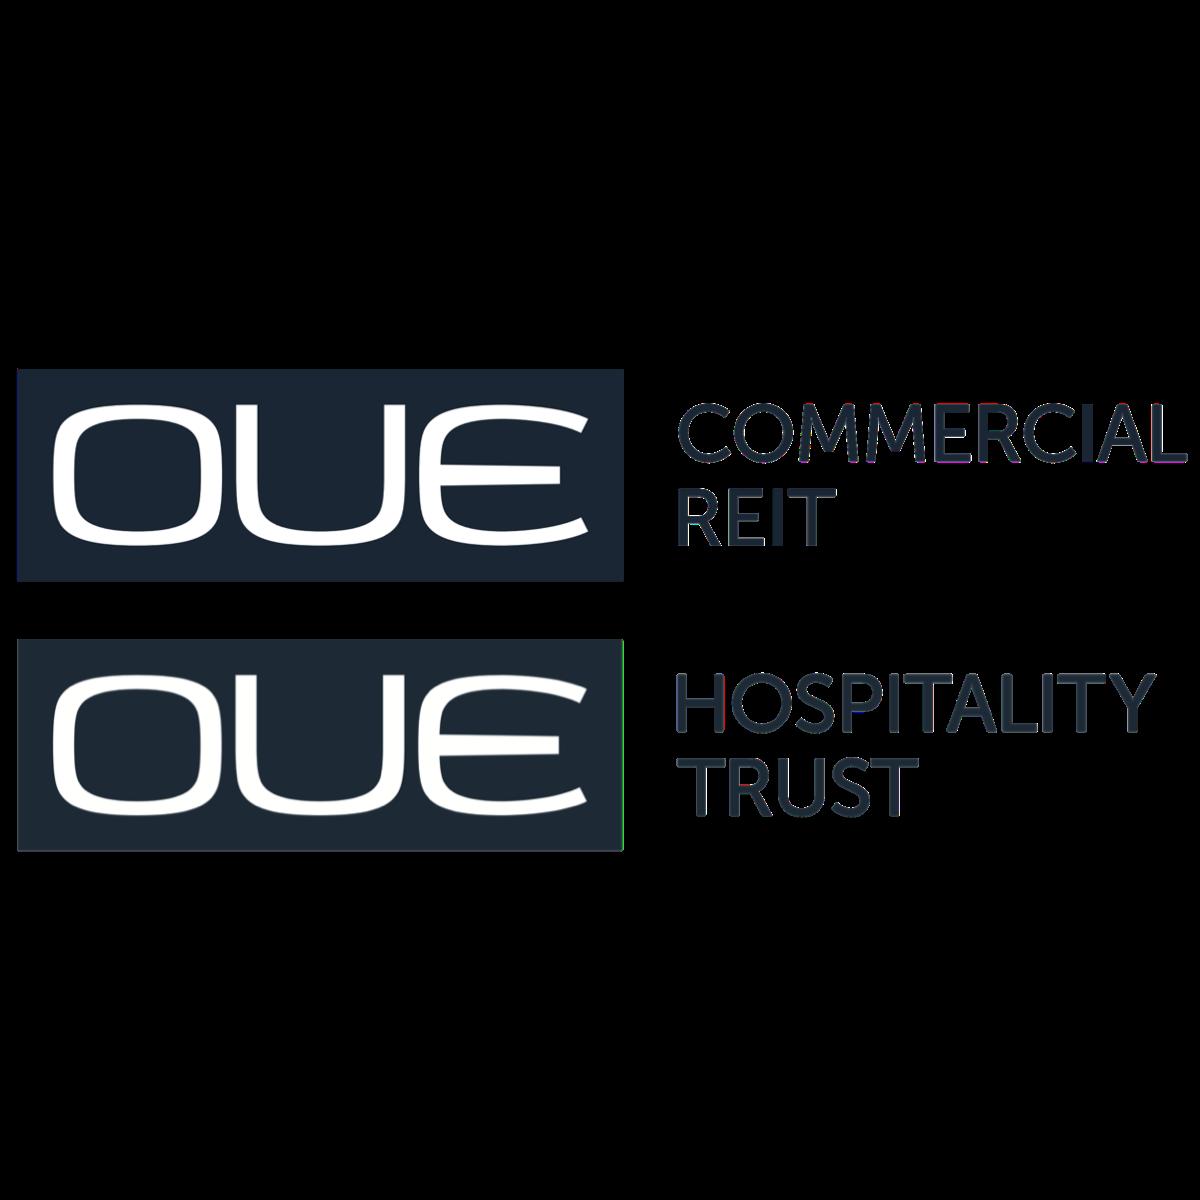 OUE COMMERCIAL REIT (SGX:TS0U) & OUE HOSPITALITY TRUST (SGX:KK7) | SGinvestors.io